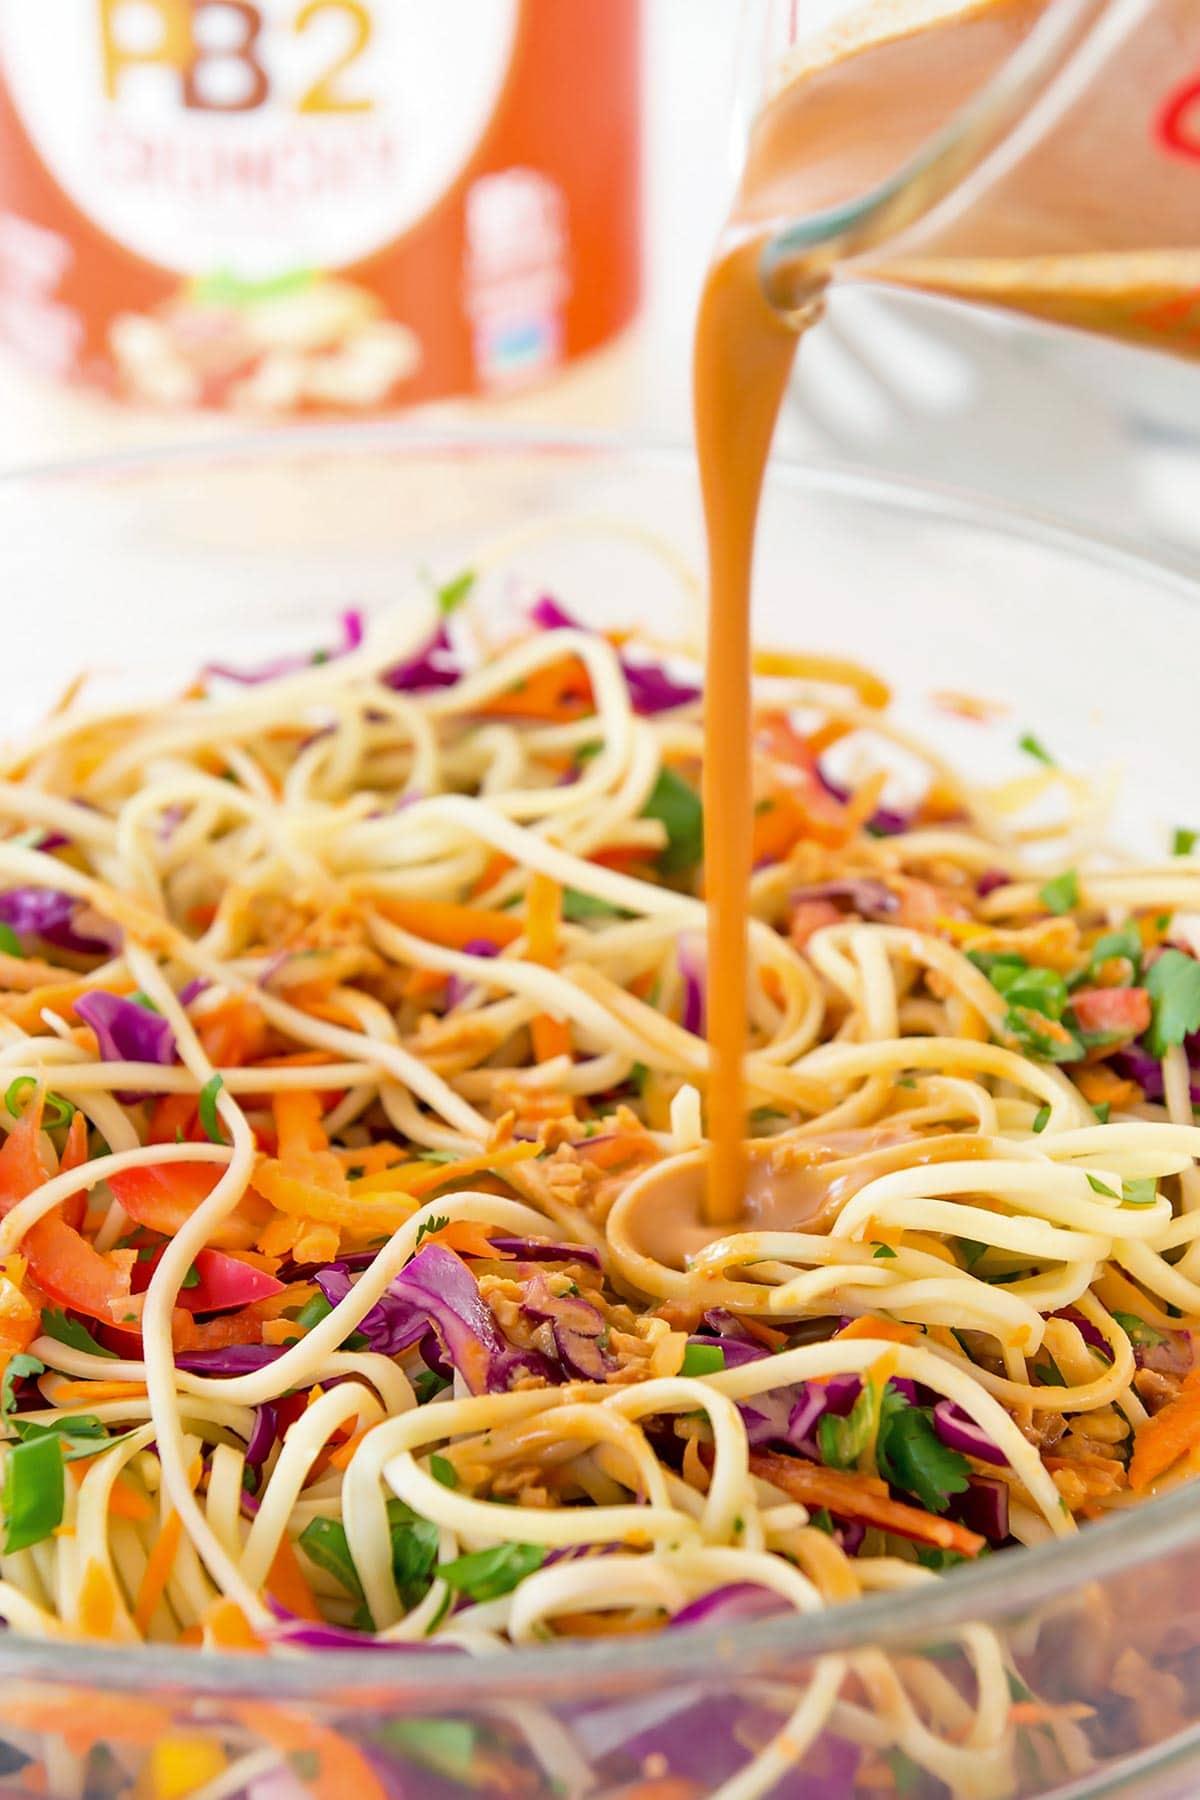 Thai peanut noodle salad dressing being poured on